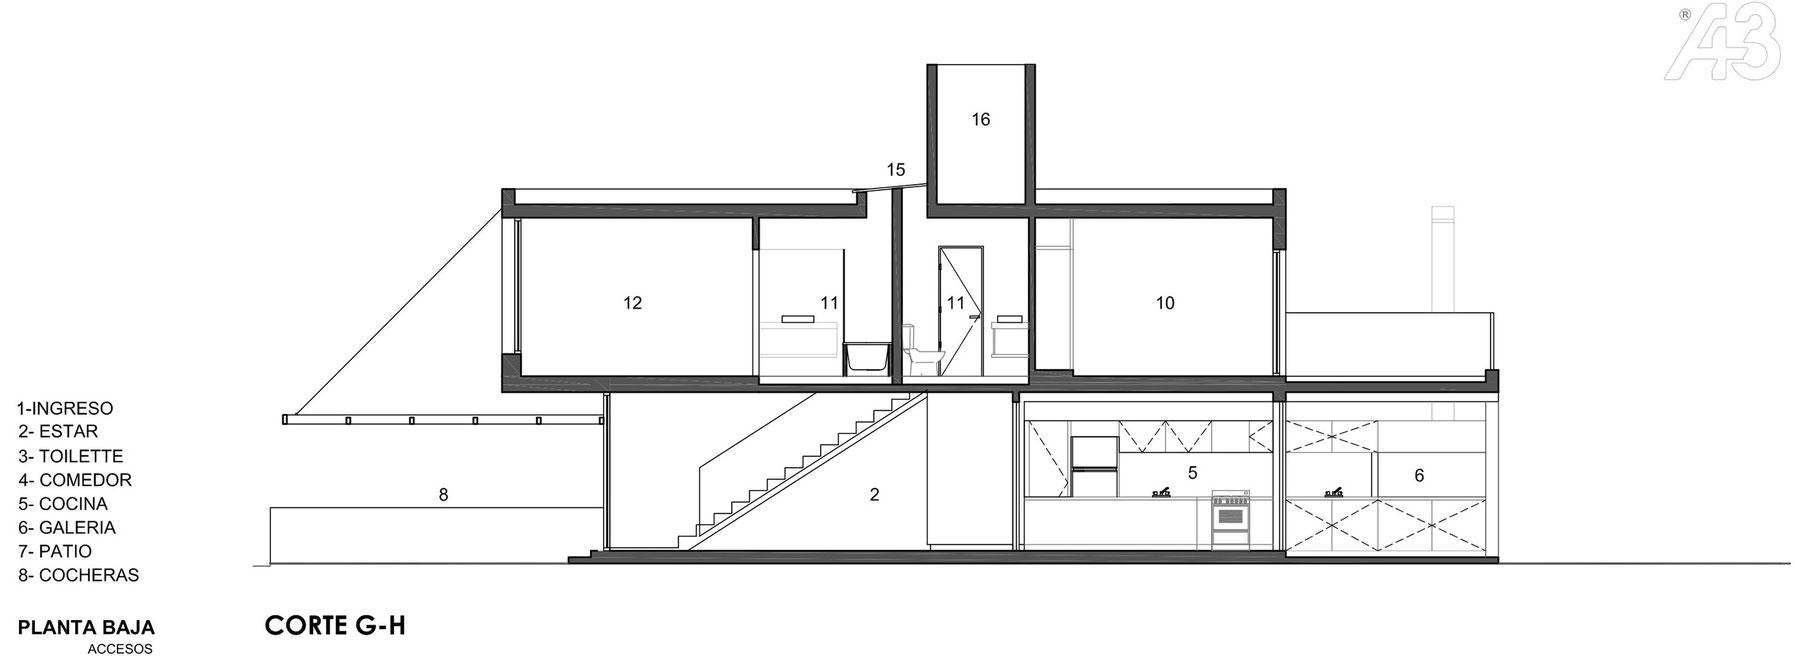 Terraced Houses-Estudio A+3-22